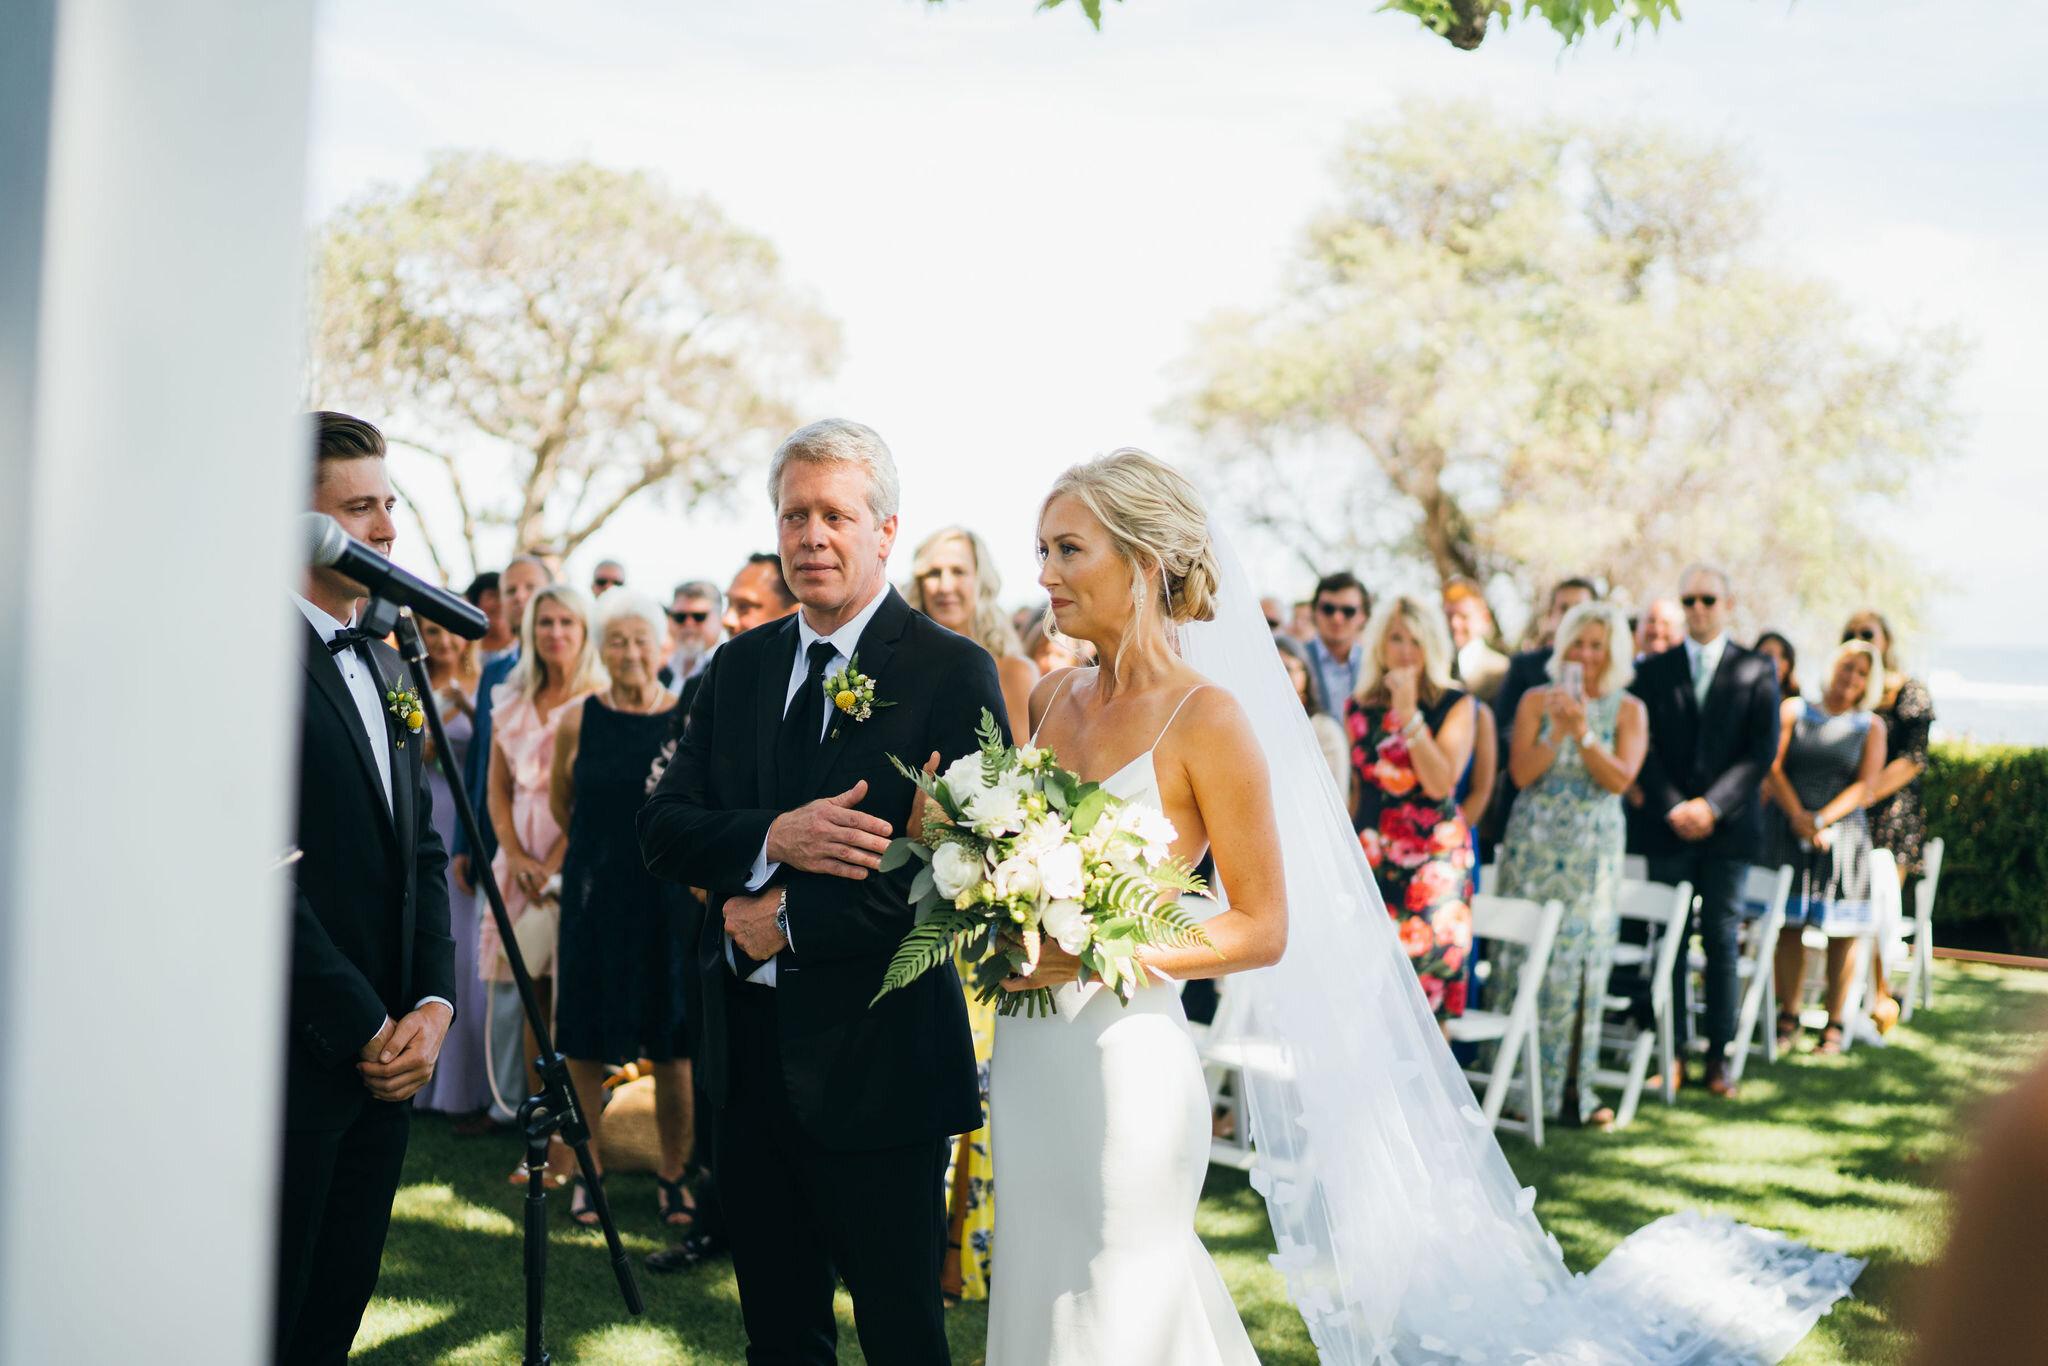 adamson-house-wedding-photography-072.jpg